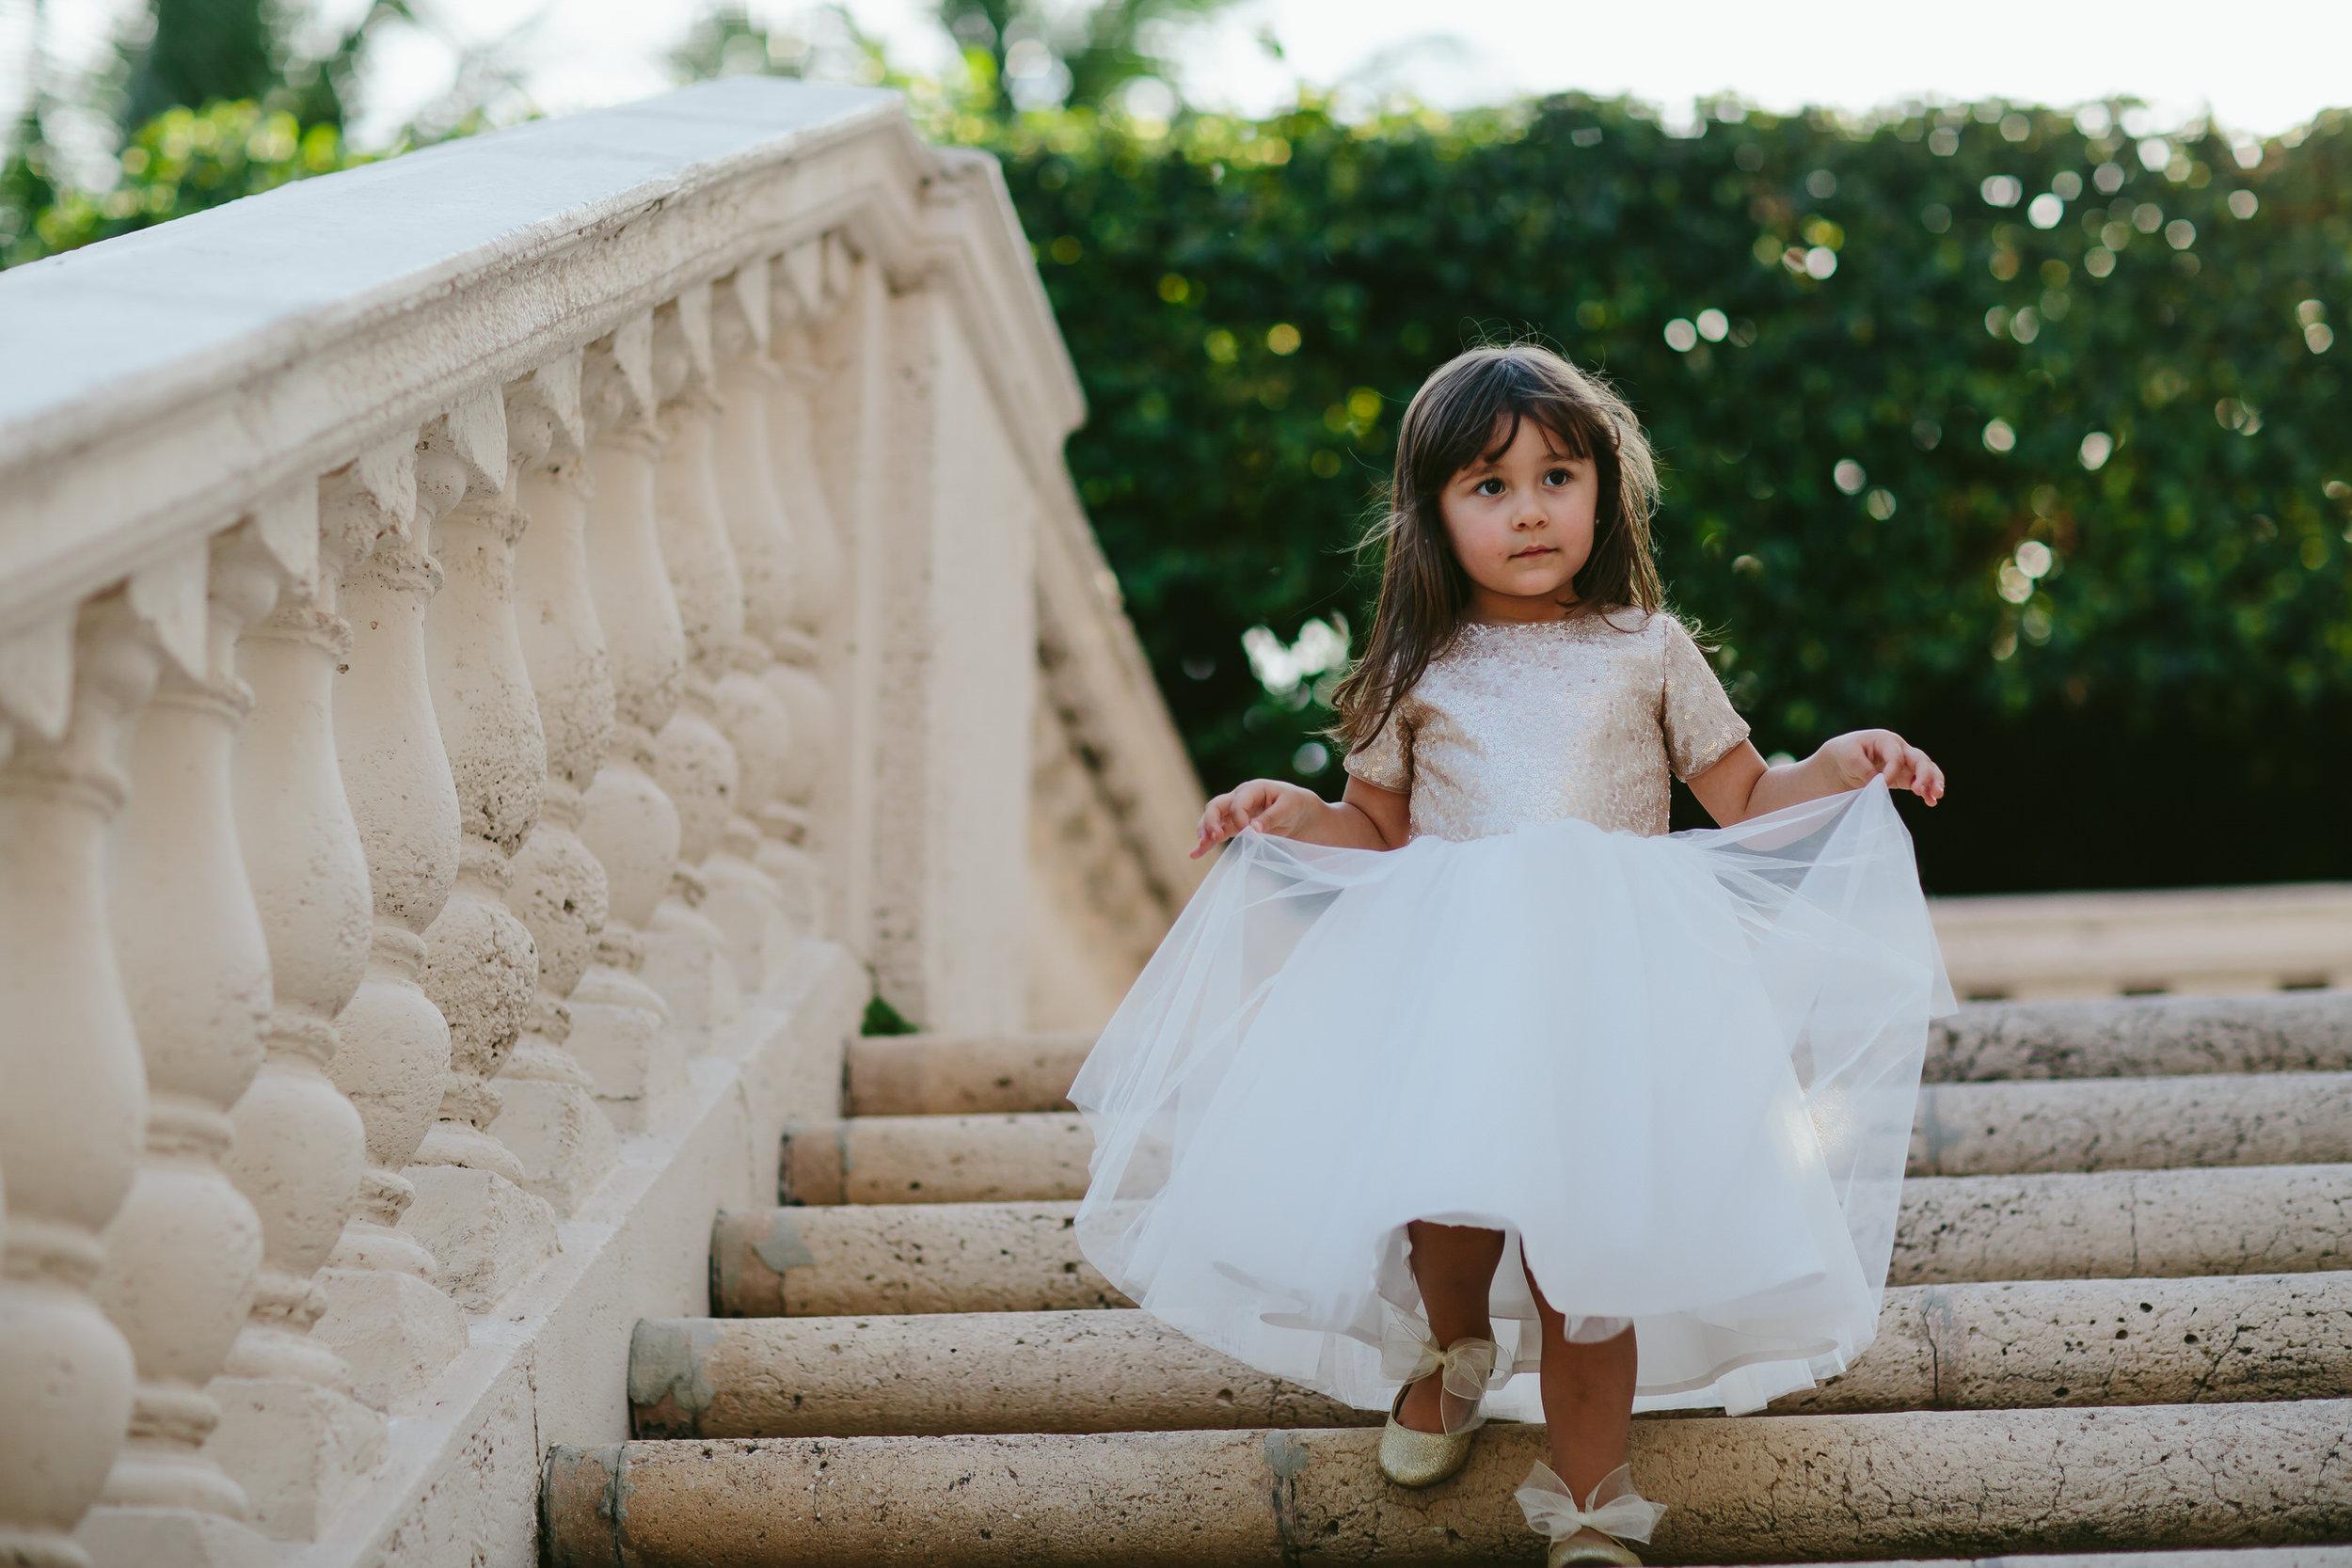 miami-biltmore-wedding-photographer-ceremony-steph-lynn-photo-9.jpg